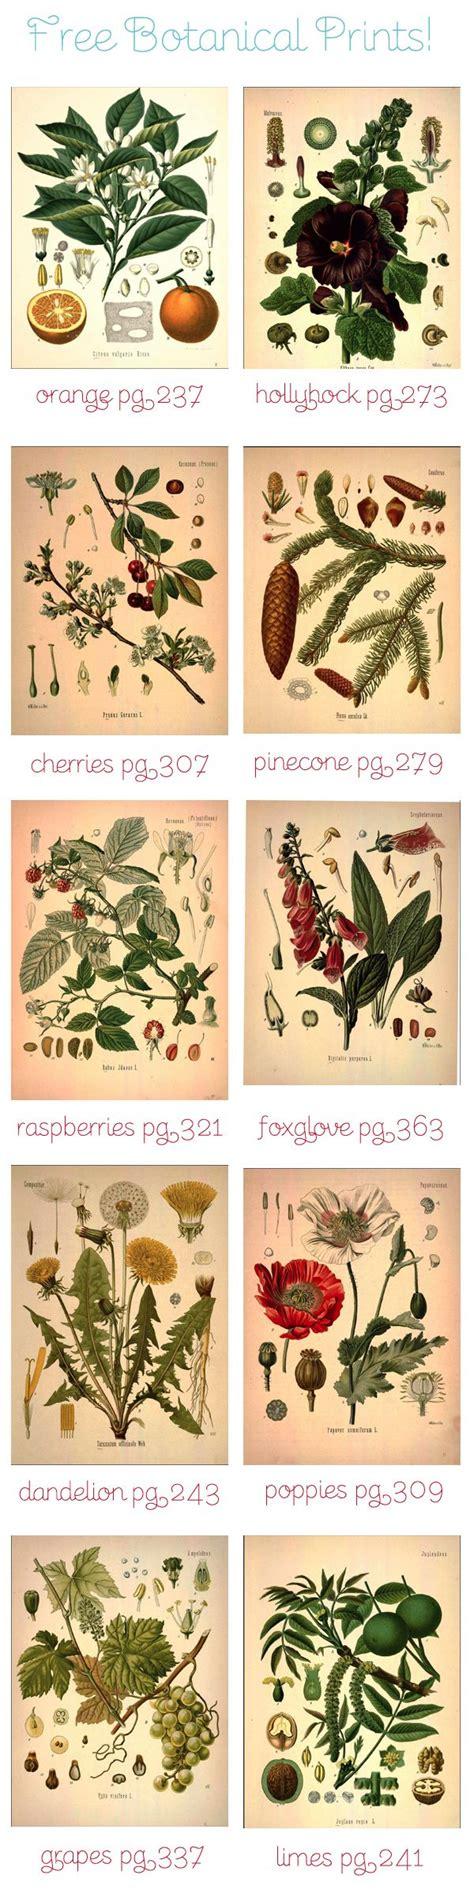 printable botanical art free botanical art house ideas pinterest botanical